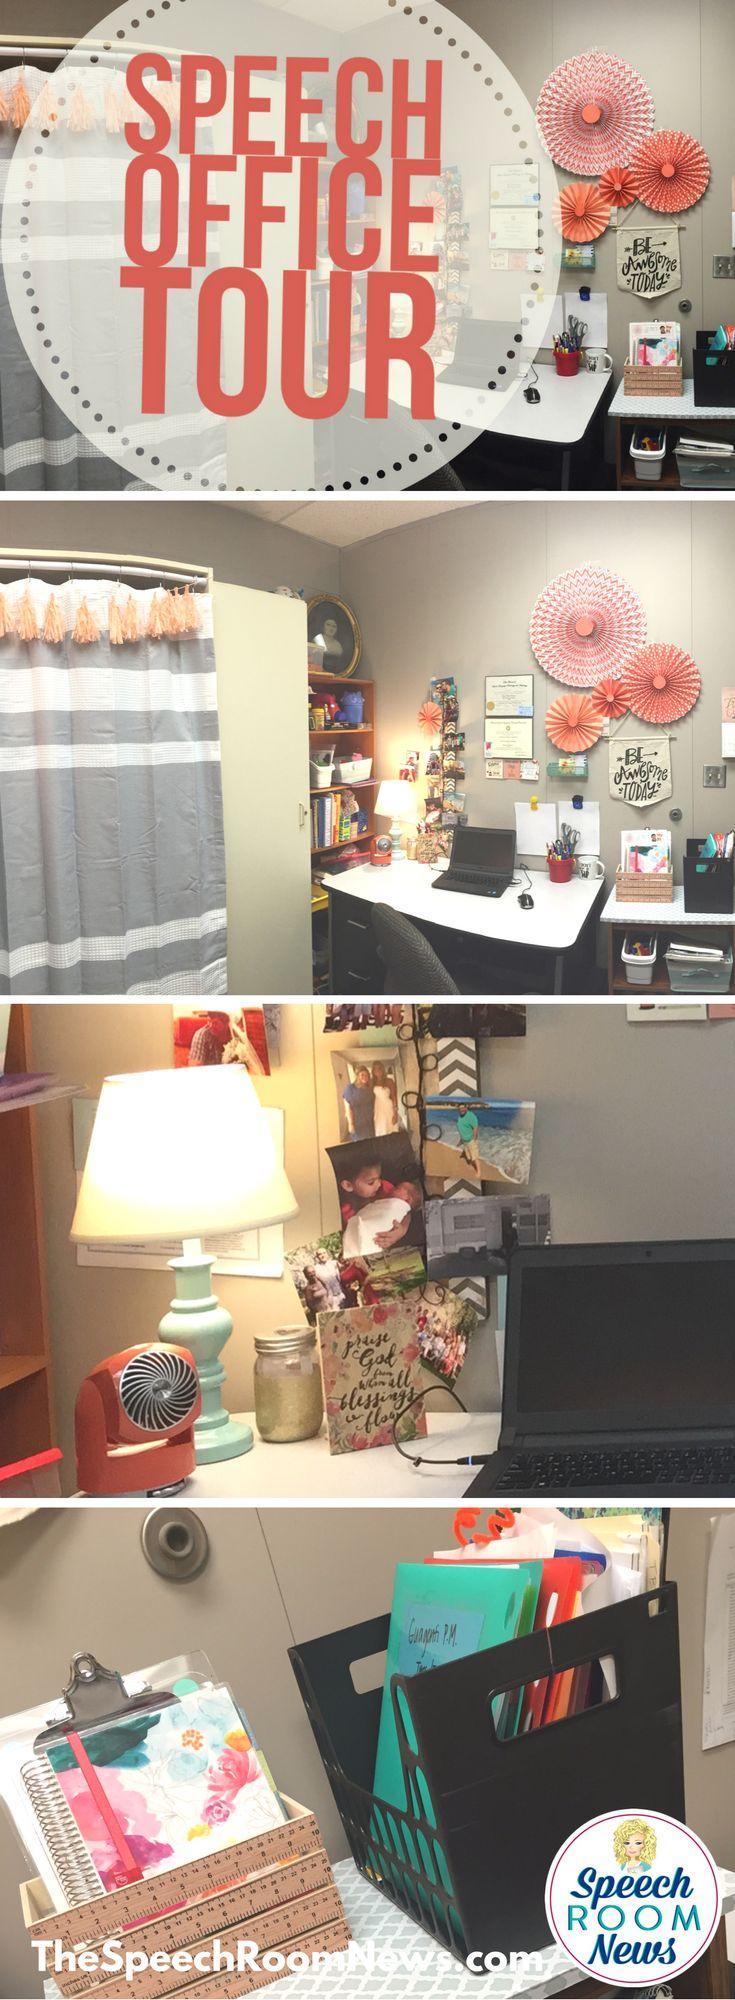 Speech Therapy Office Tour - Speech Room News', Jenna Rayburn